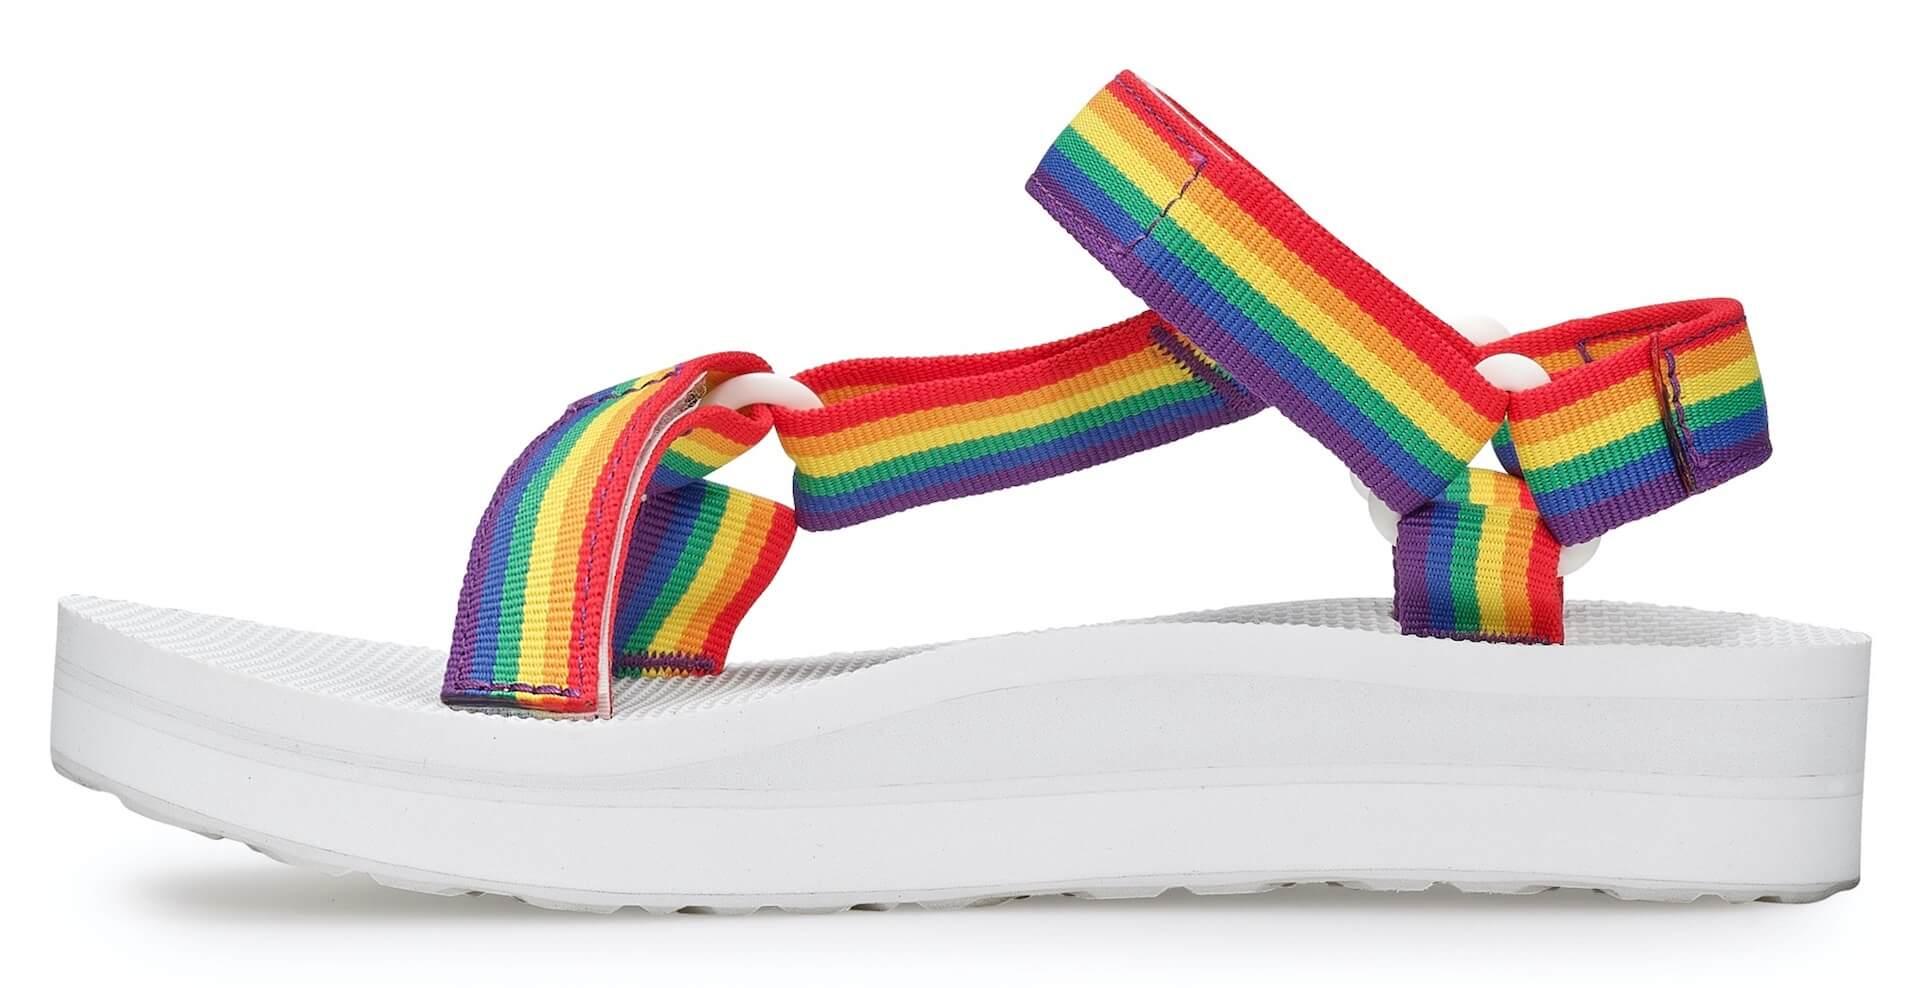 Tevaから、LGBTQ+支援団体「It Gets Better Project」記念サンダル登場!レインボーカラーの2種類 lf200421_teva_universal_15